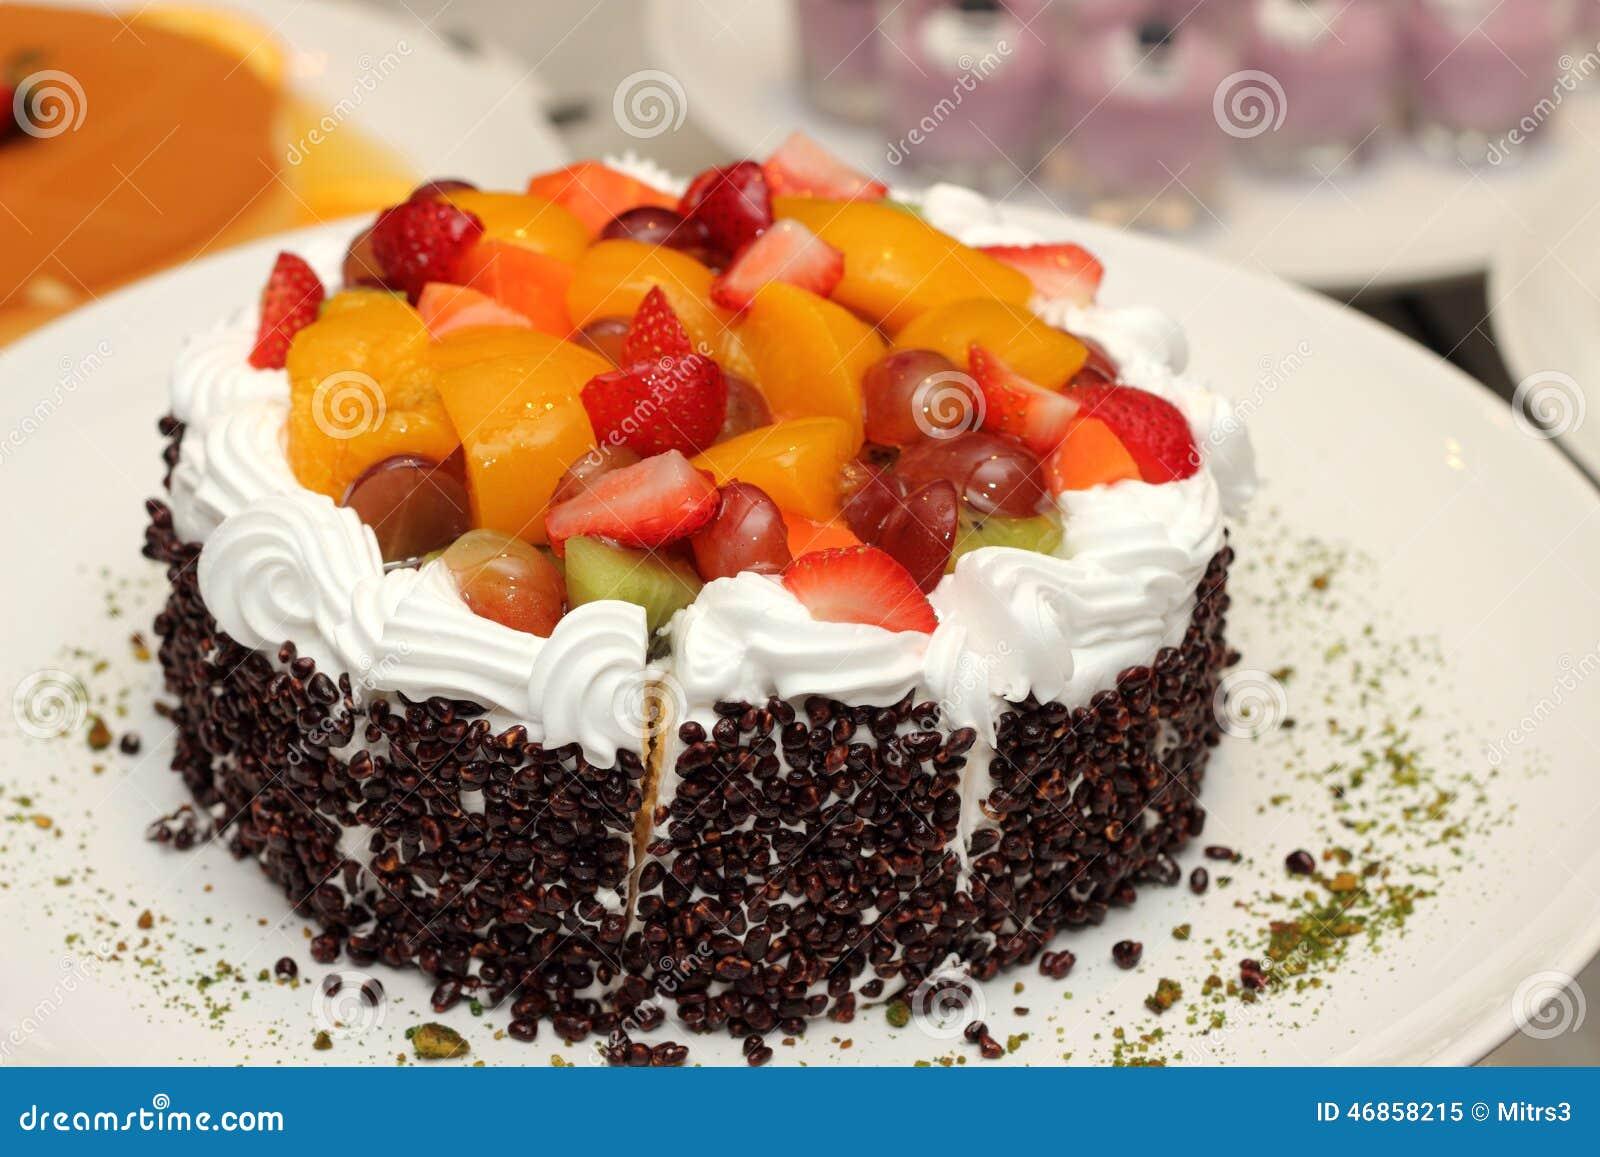 Fresh Fruit Flan Cake With Cream Stock Photo - Image: 46858215